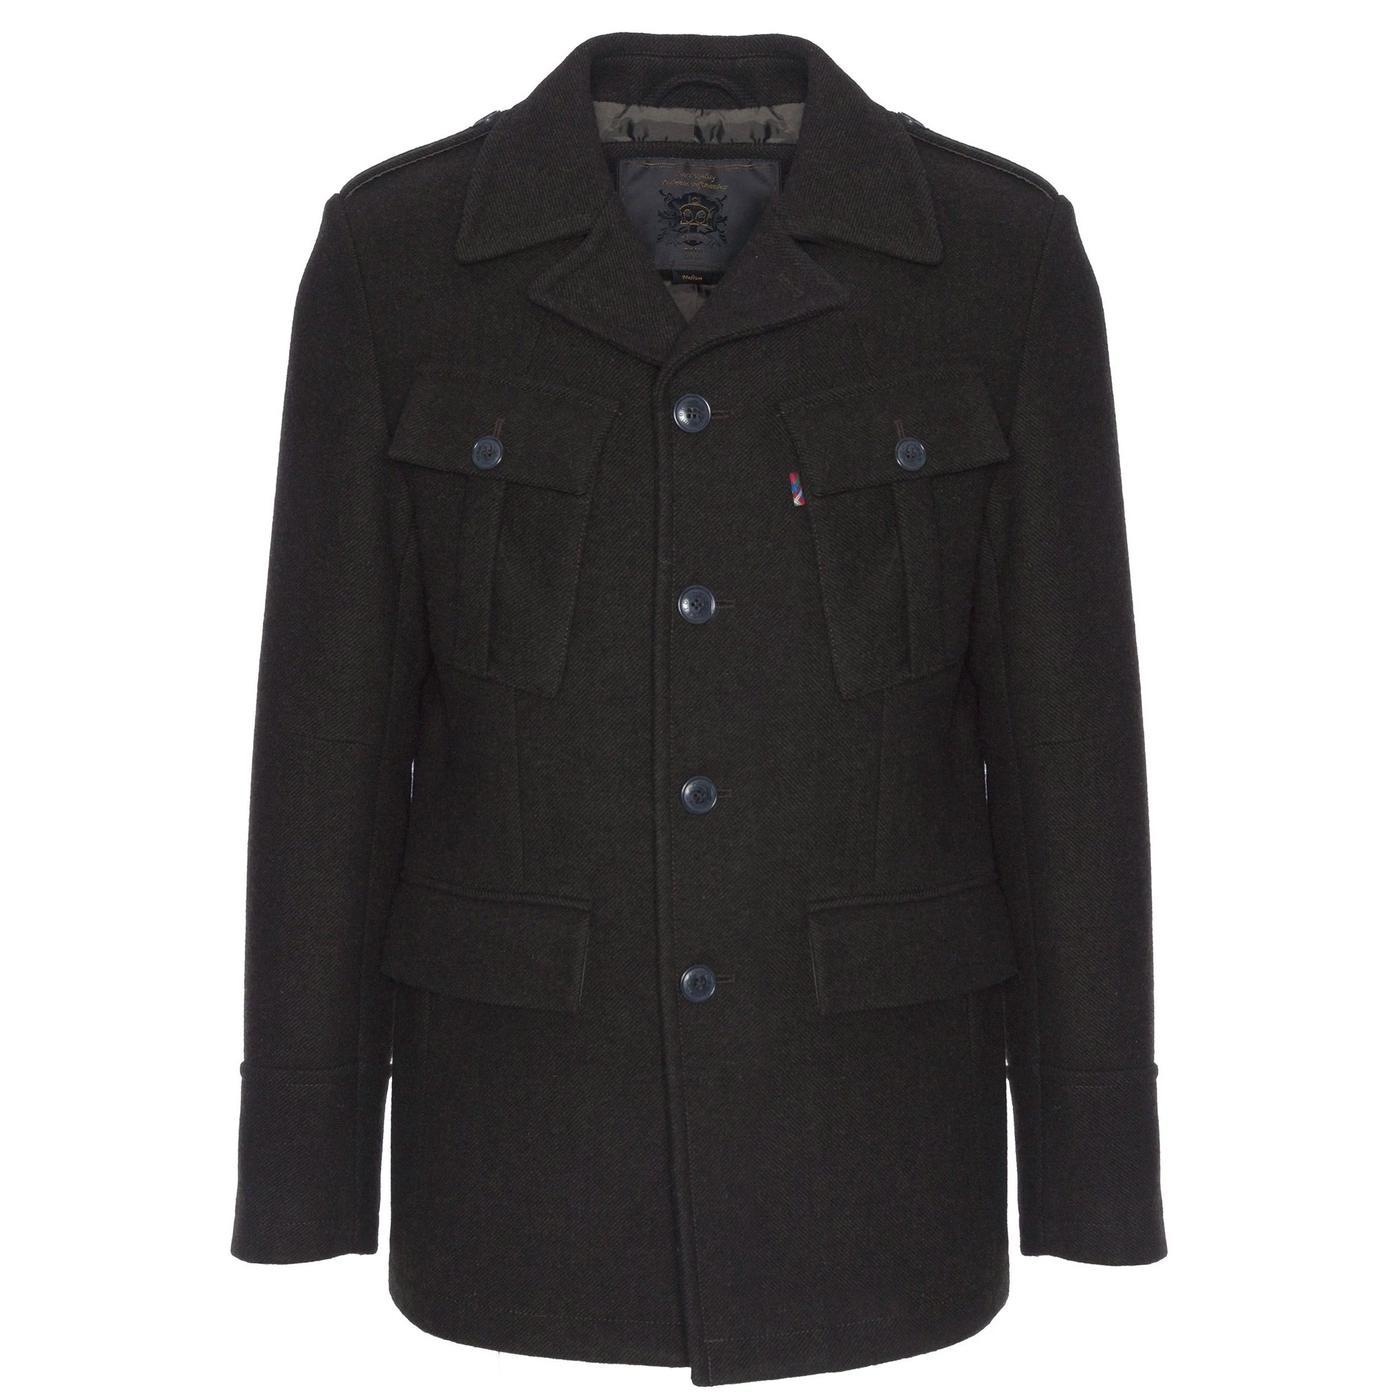 Haworth MERC Retro 60s Military Wool Field Jacket